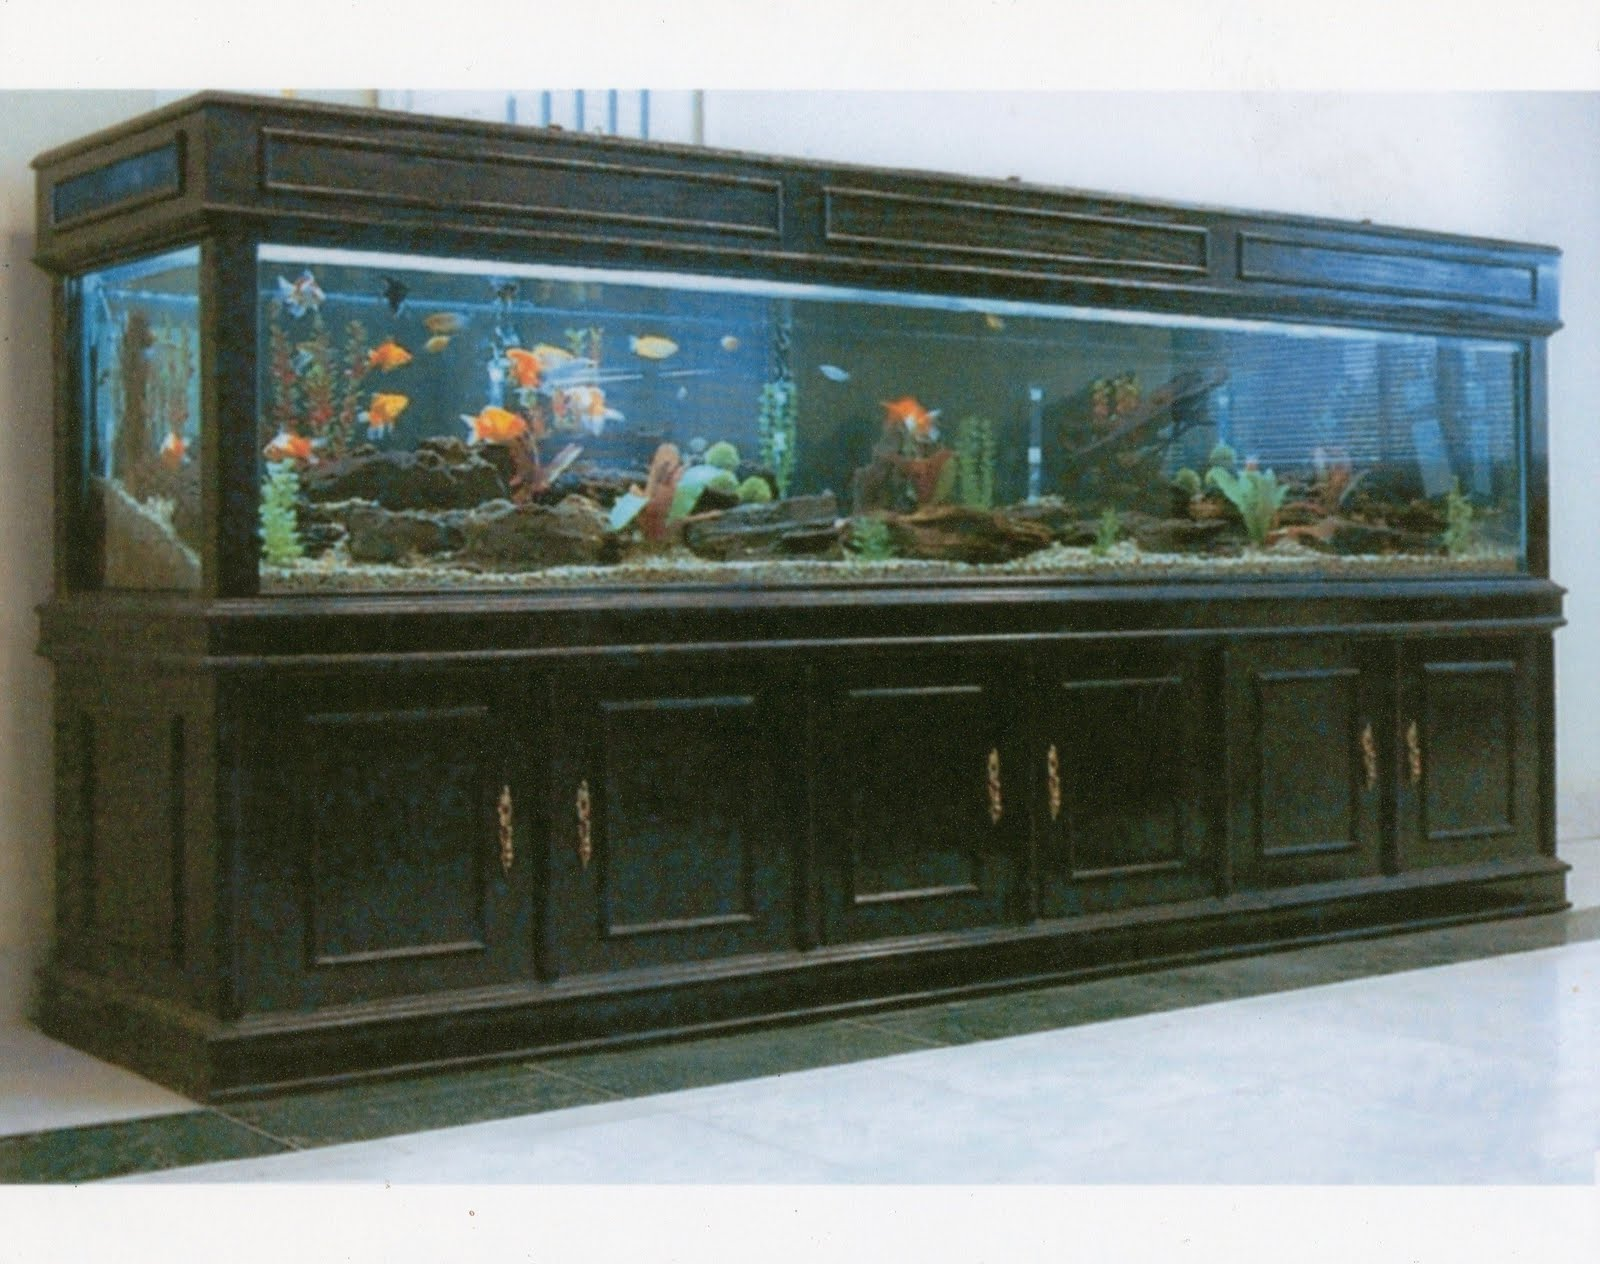 Fish aquarium karachi - Fish Aquarium Karachi